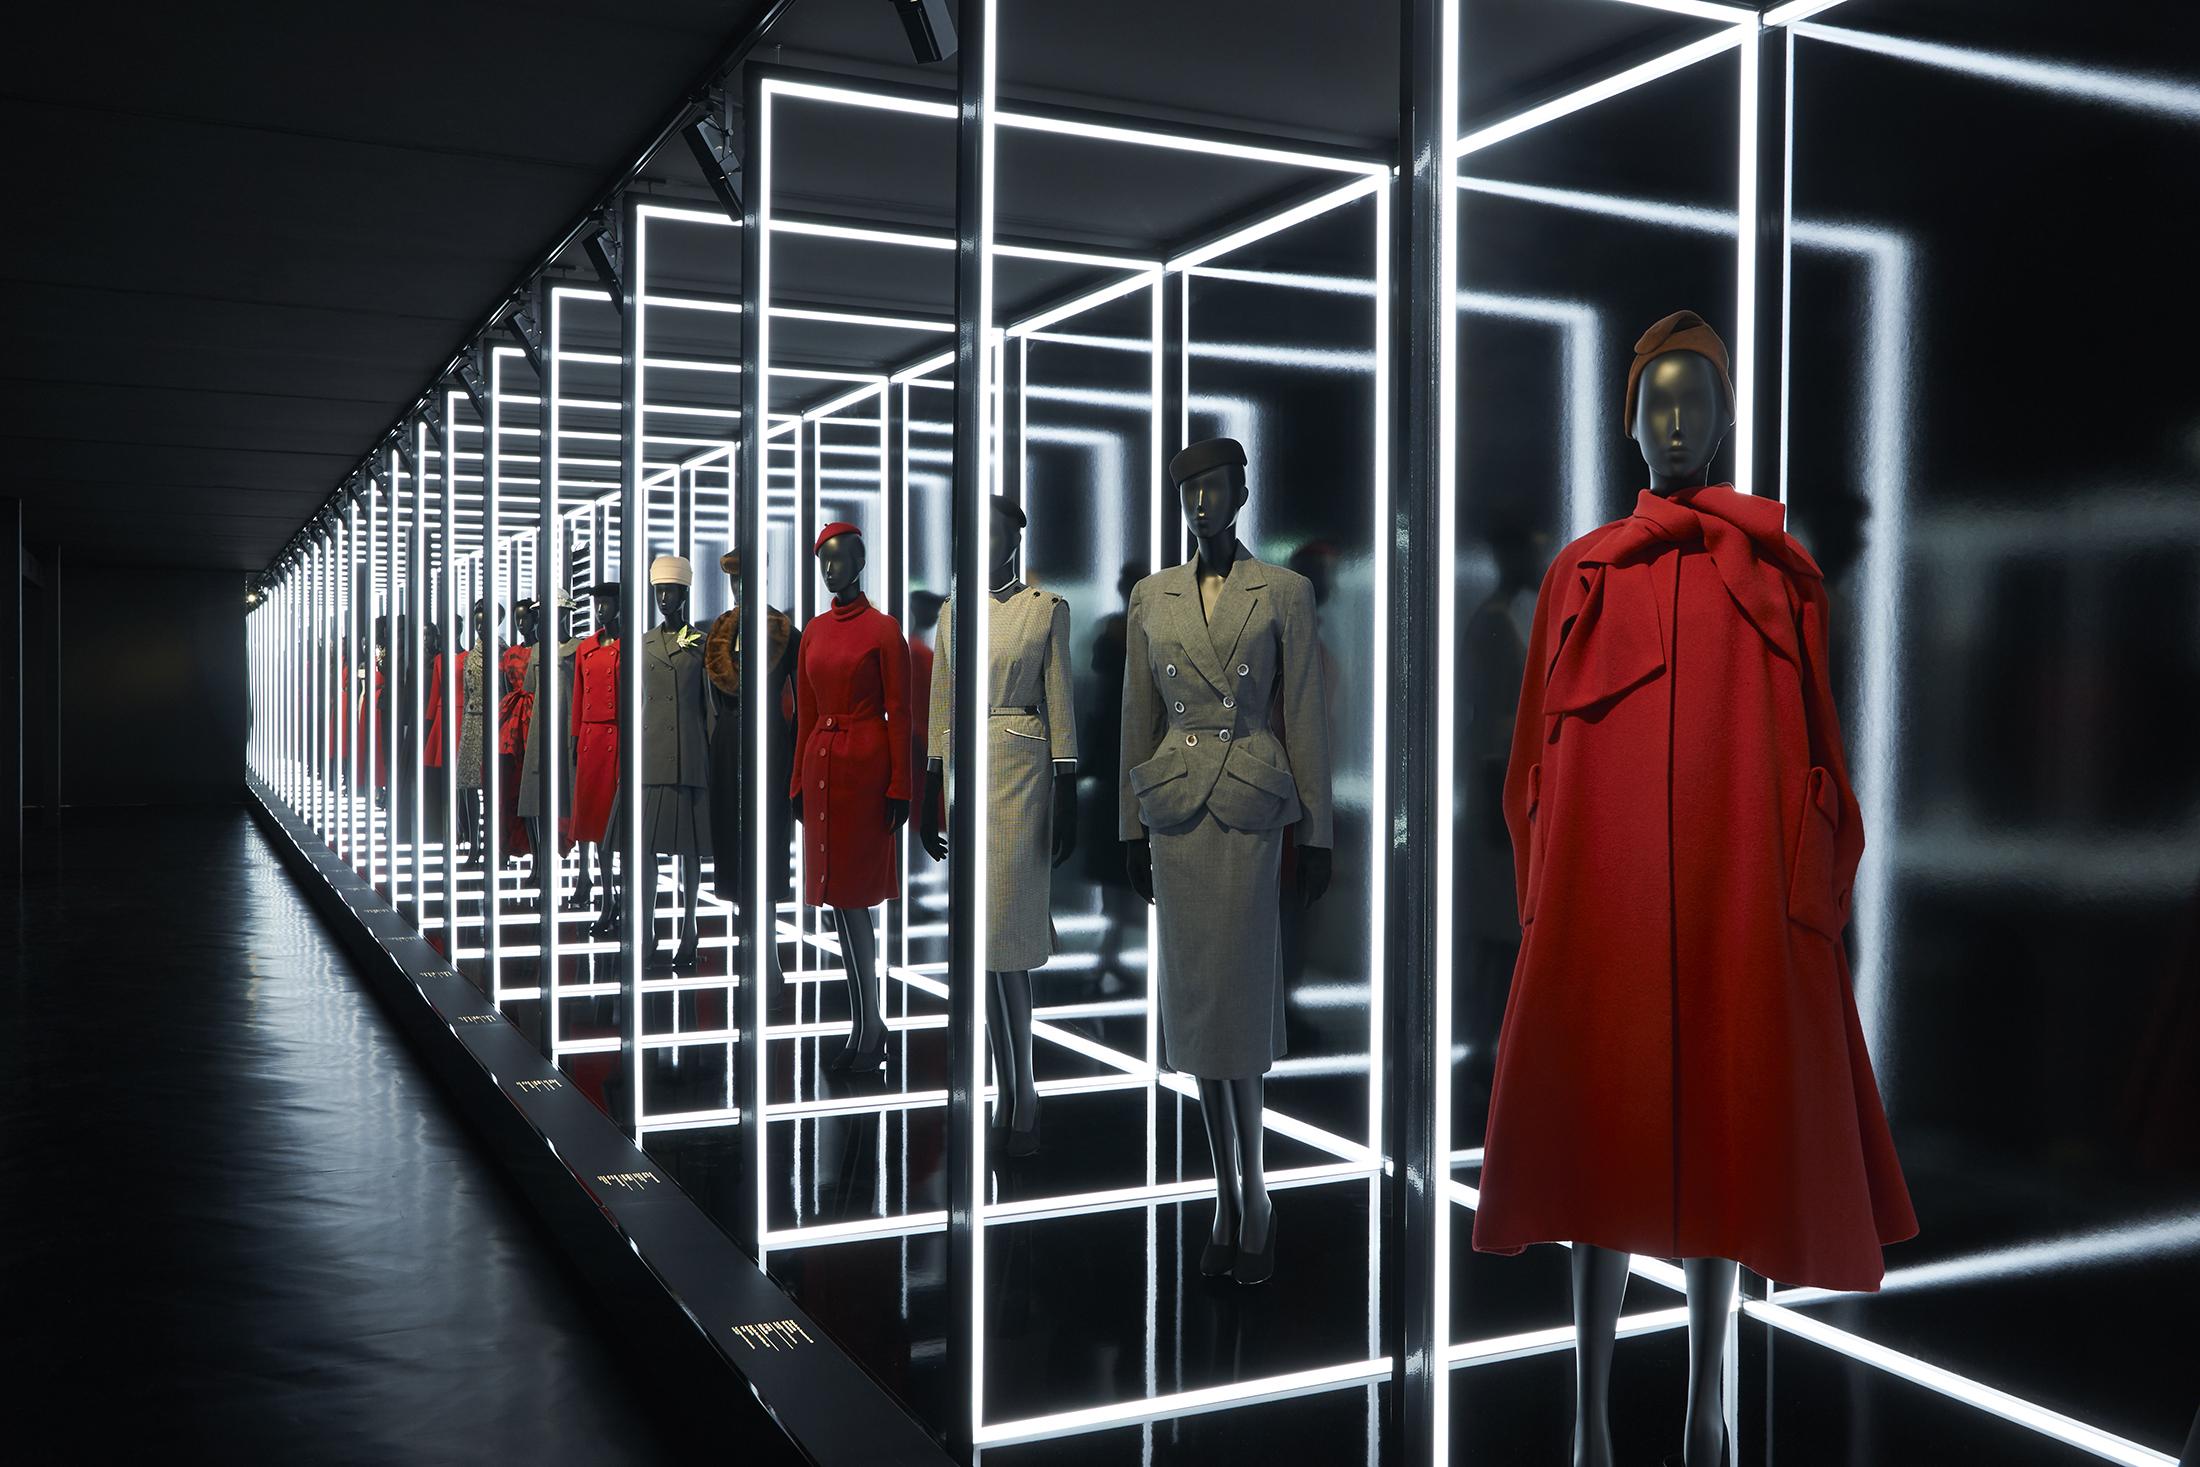 Christian Dior Fashion Ad Campaign Documentary Film